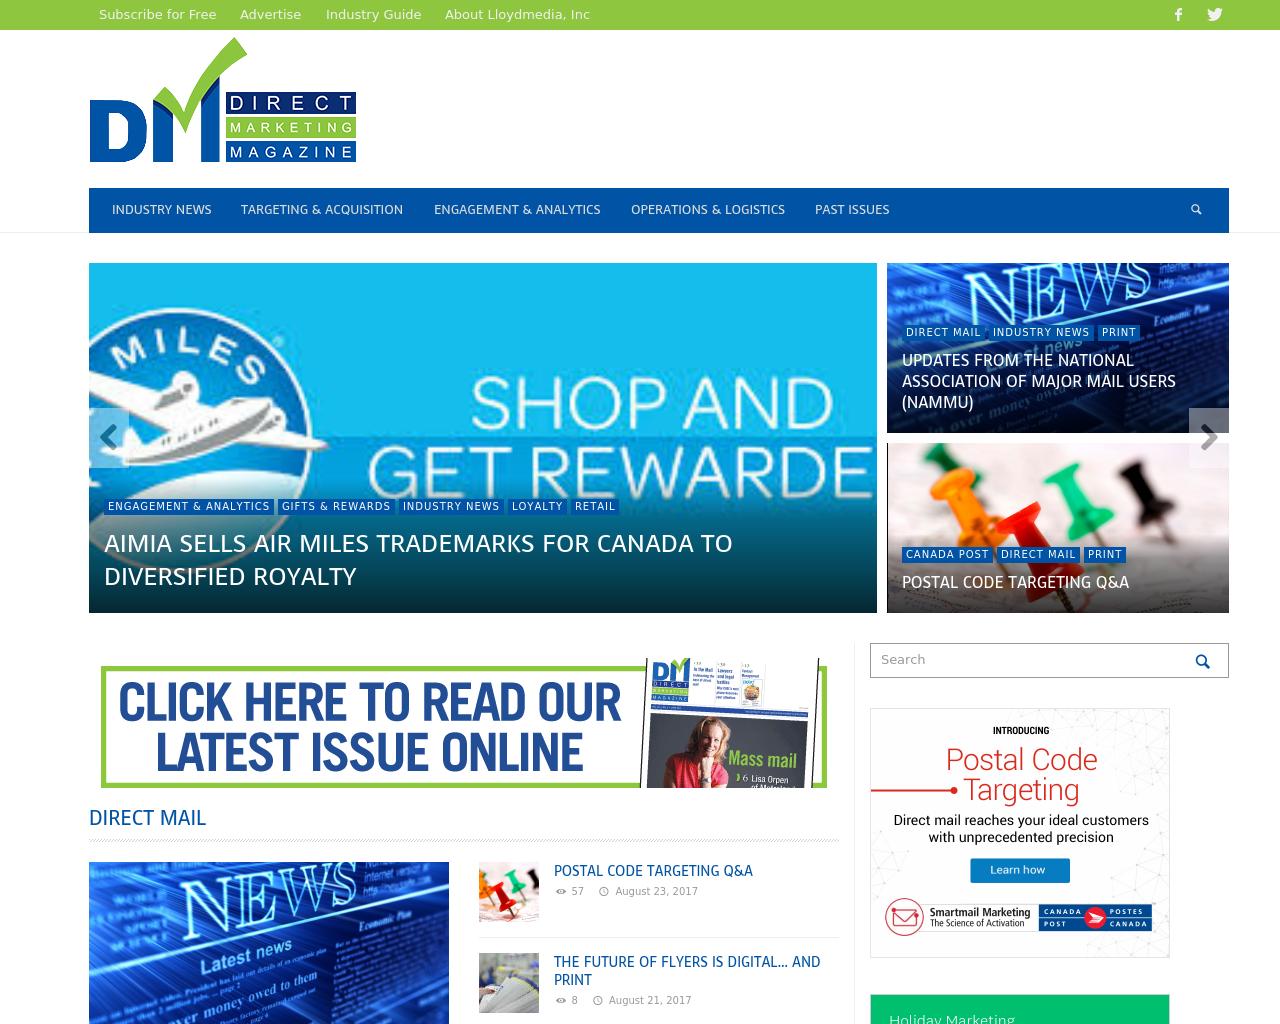 Direct-Marketing-Magazine-Advertising-Reviews-Pricing